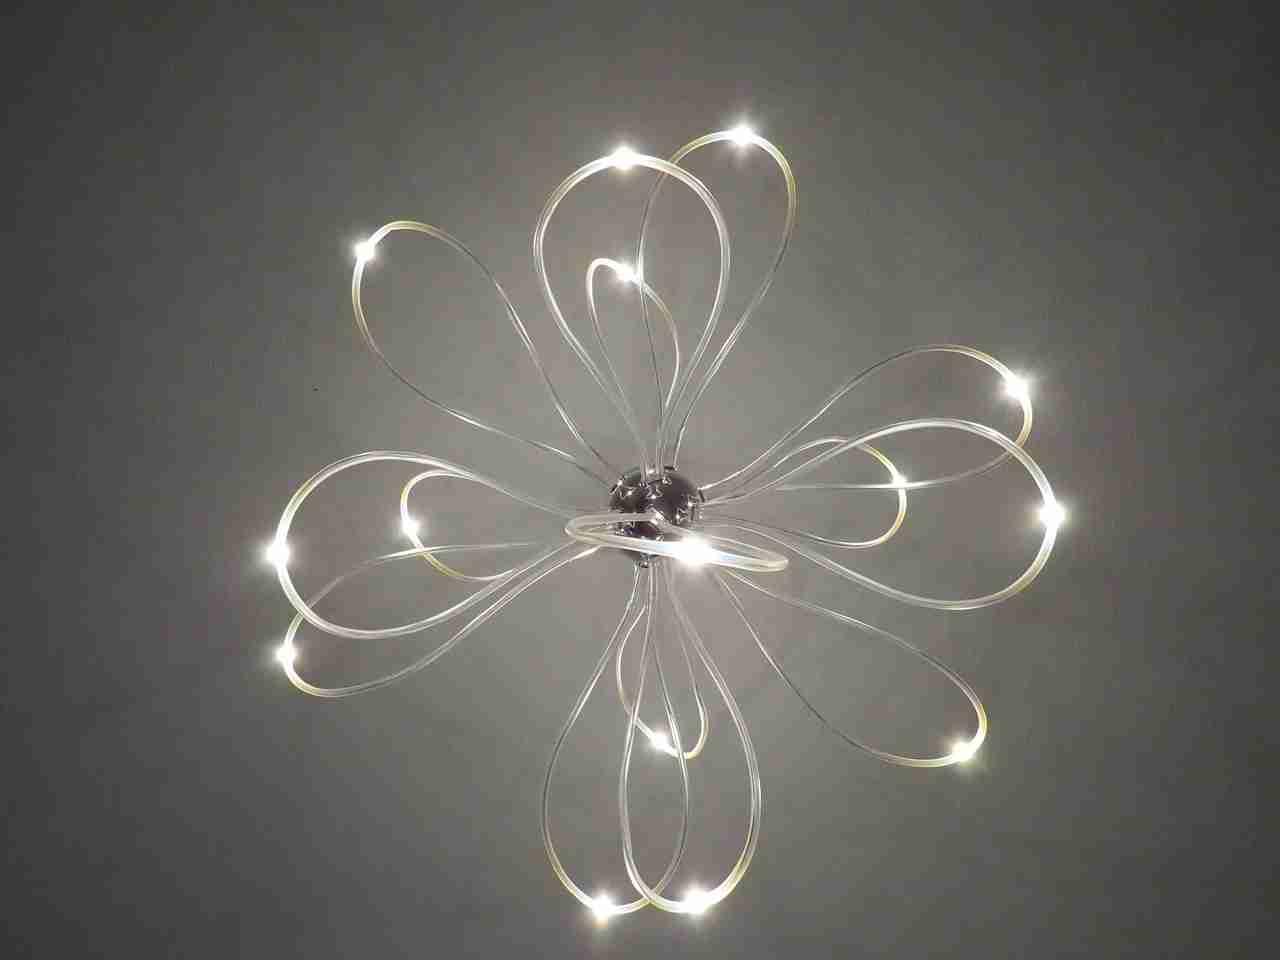 LED Lampe selbst bauen